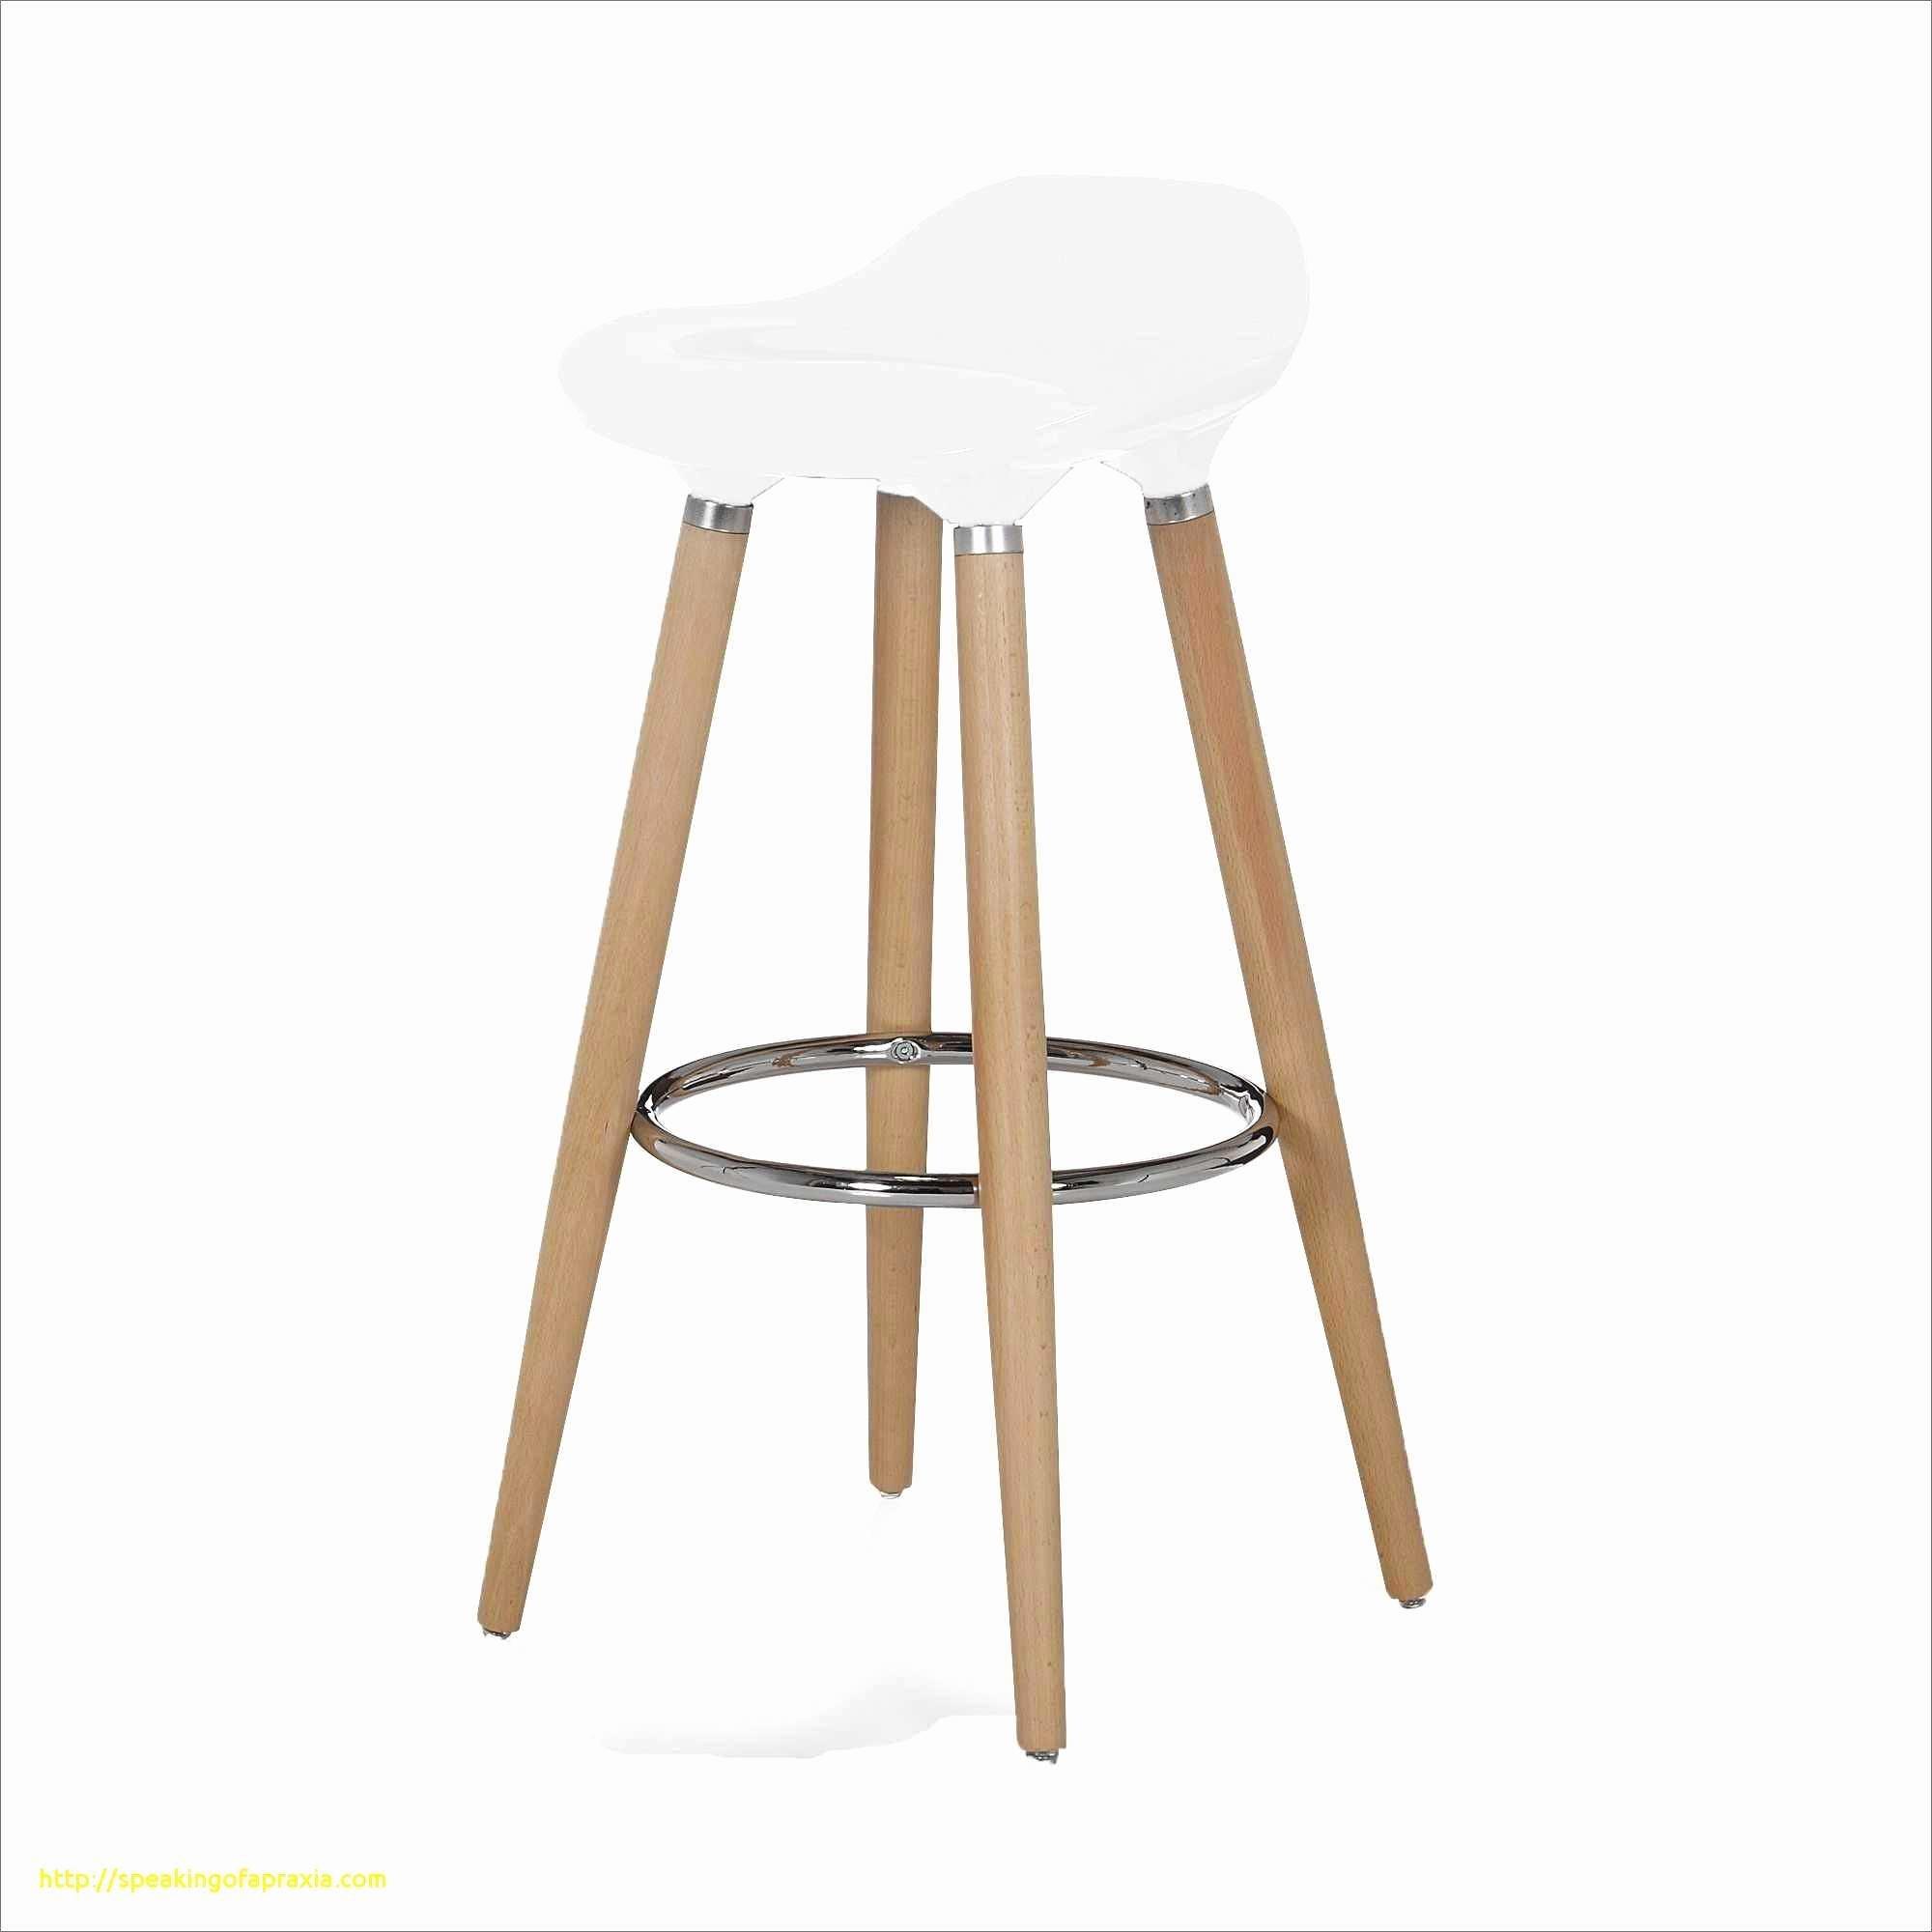 chaise de cuisine alinea beau chaise cuisine alinea impressionnant chaise fly meilleur chaise of chaise de cuisine alinea